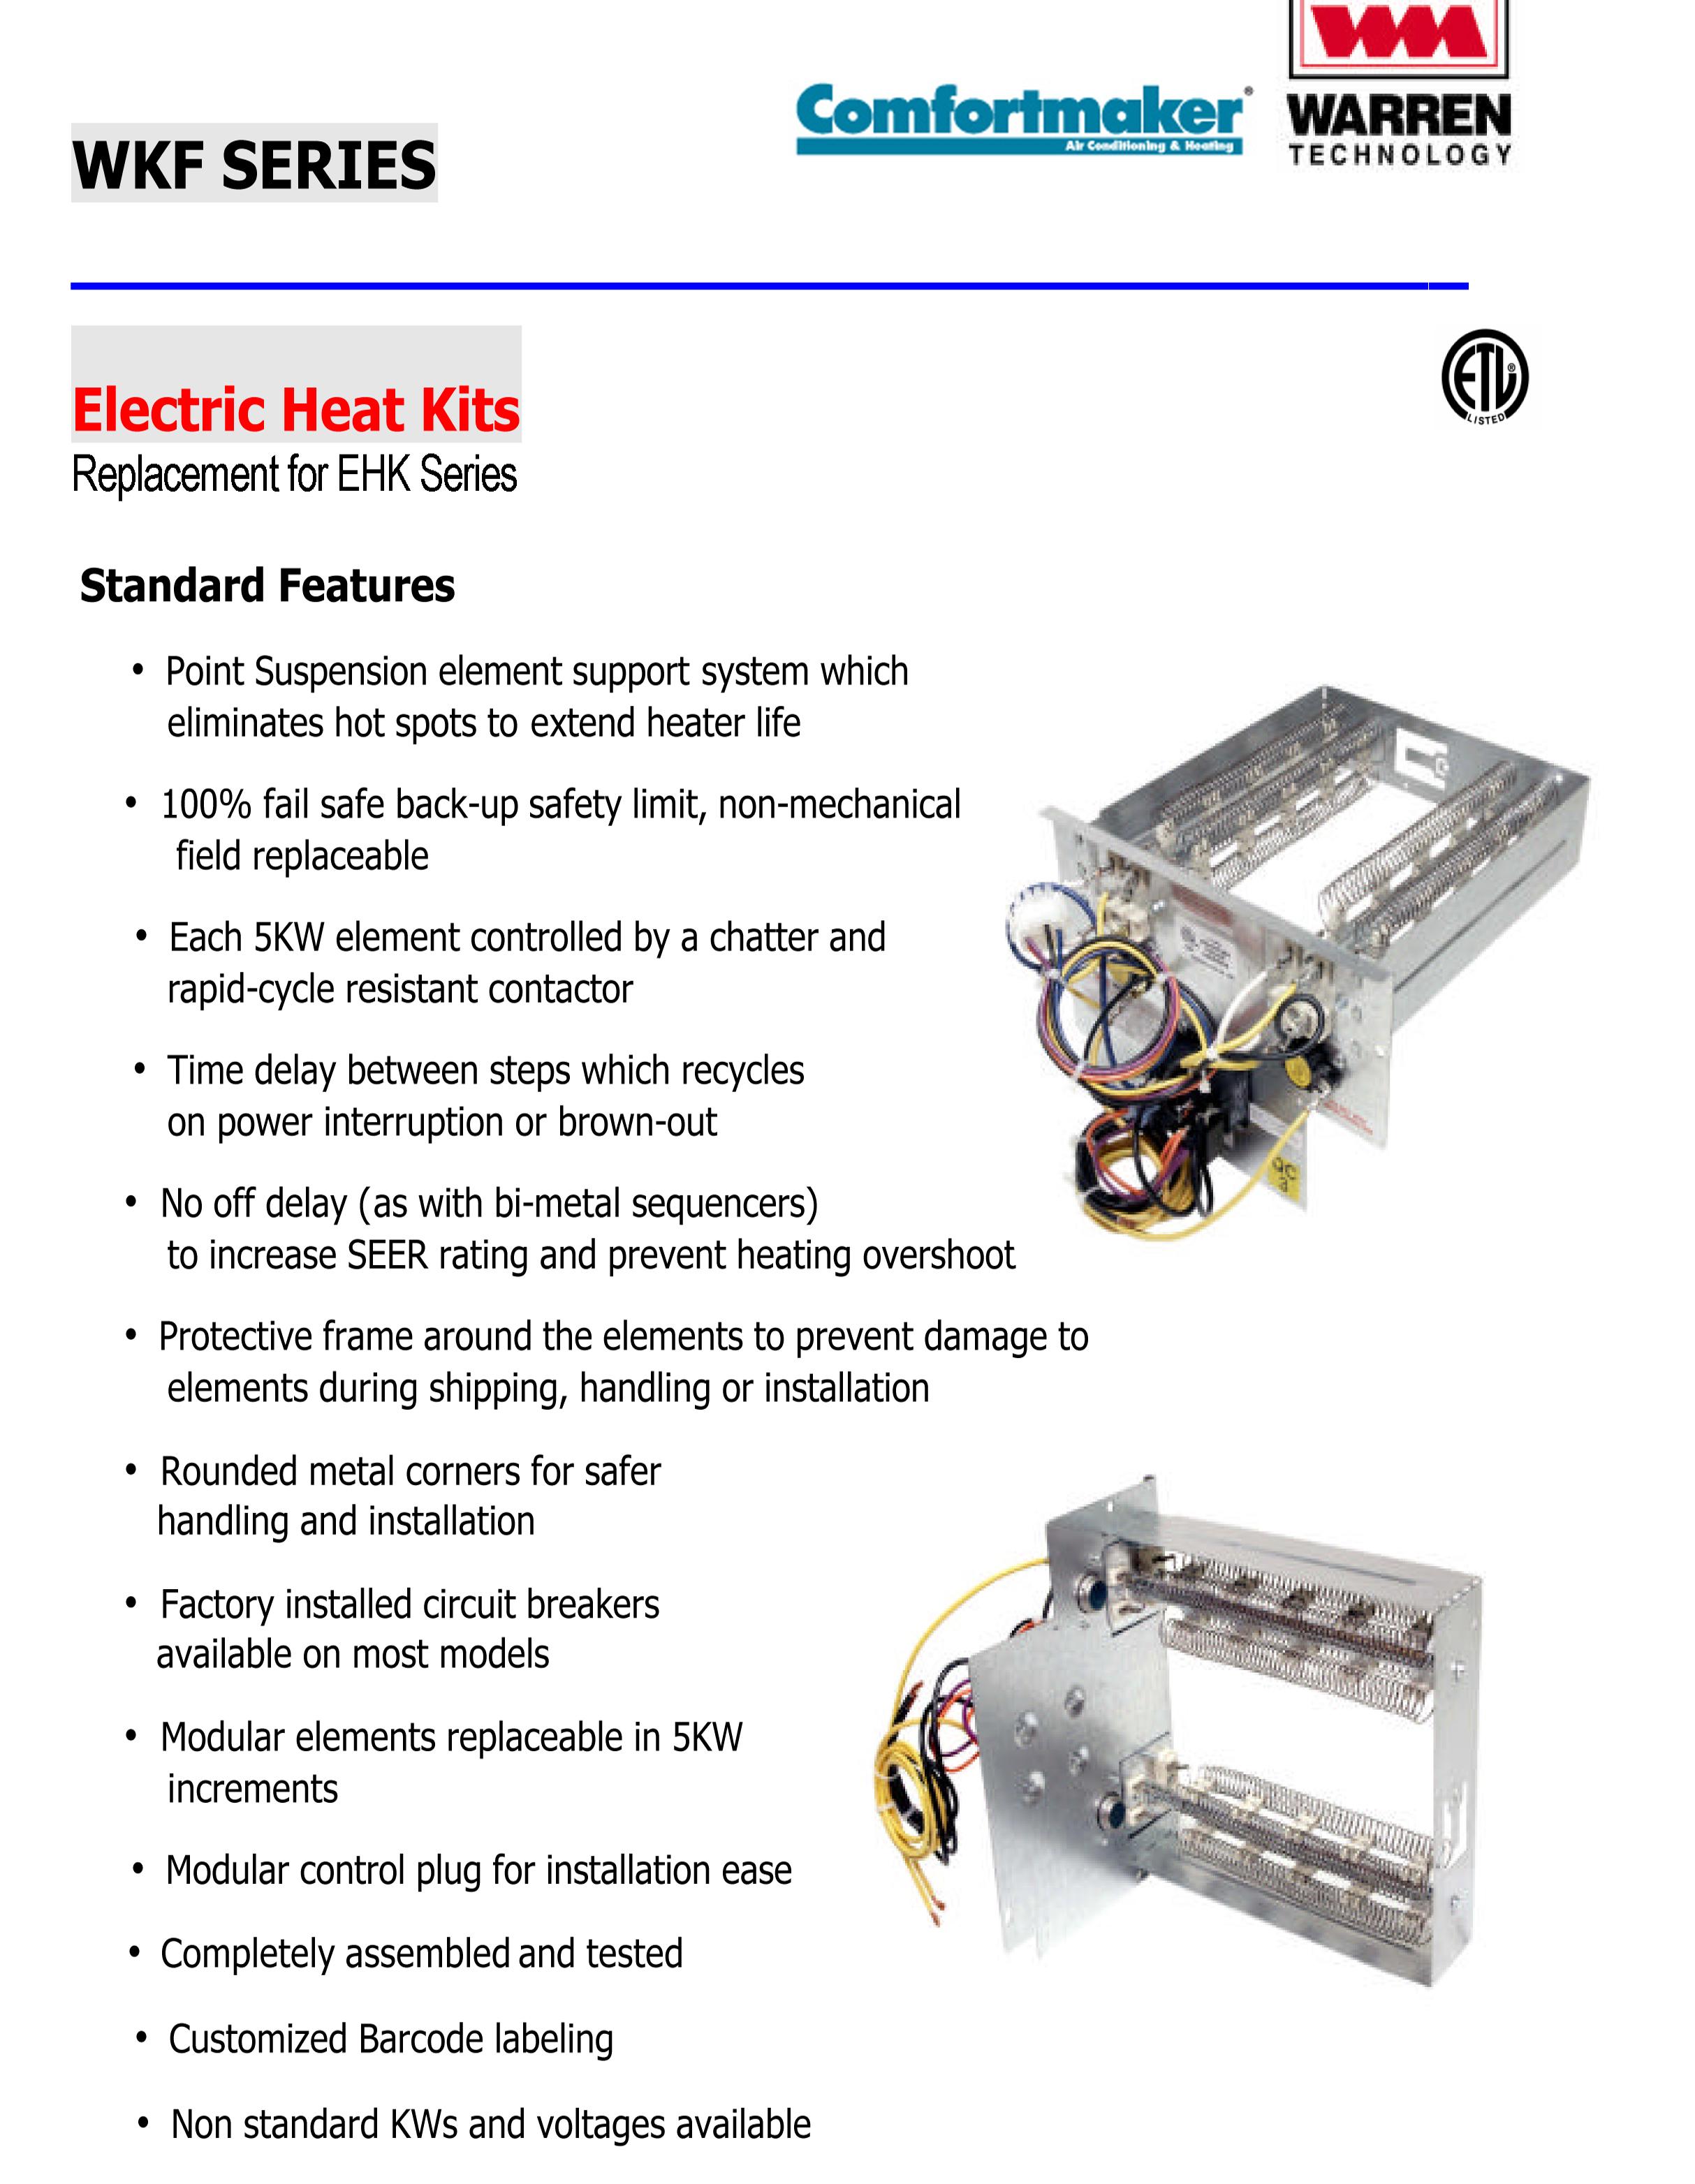 lennox heat pump thermostat wiring diagram software to draw data flow bryant goodman circuit diagrams warren hvac library